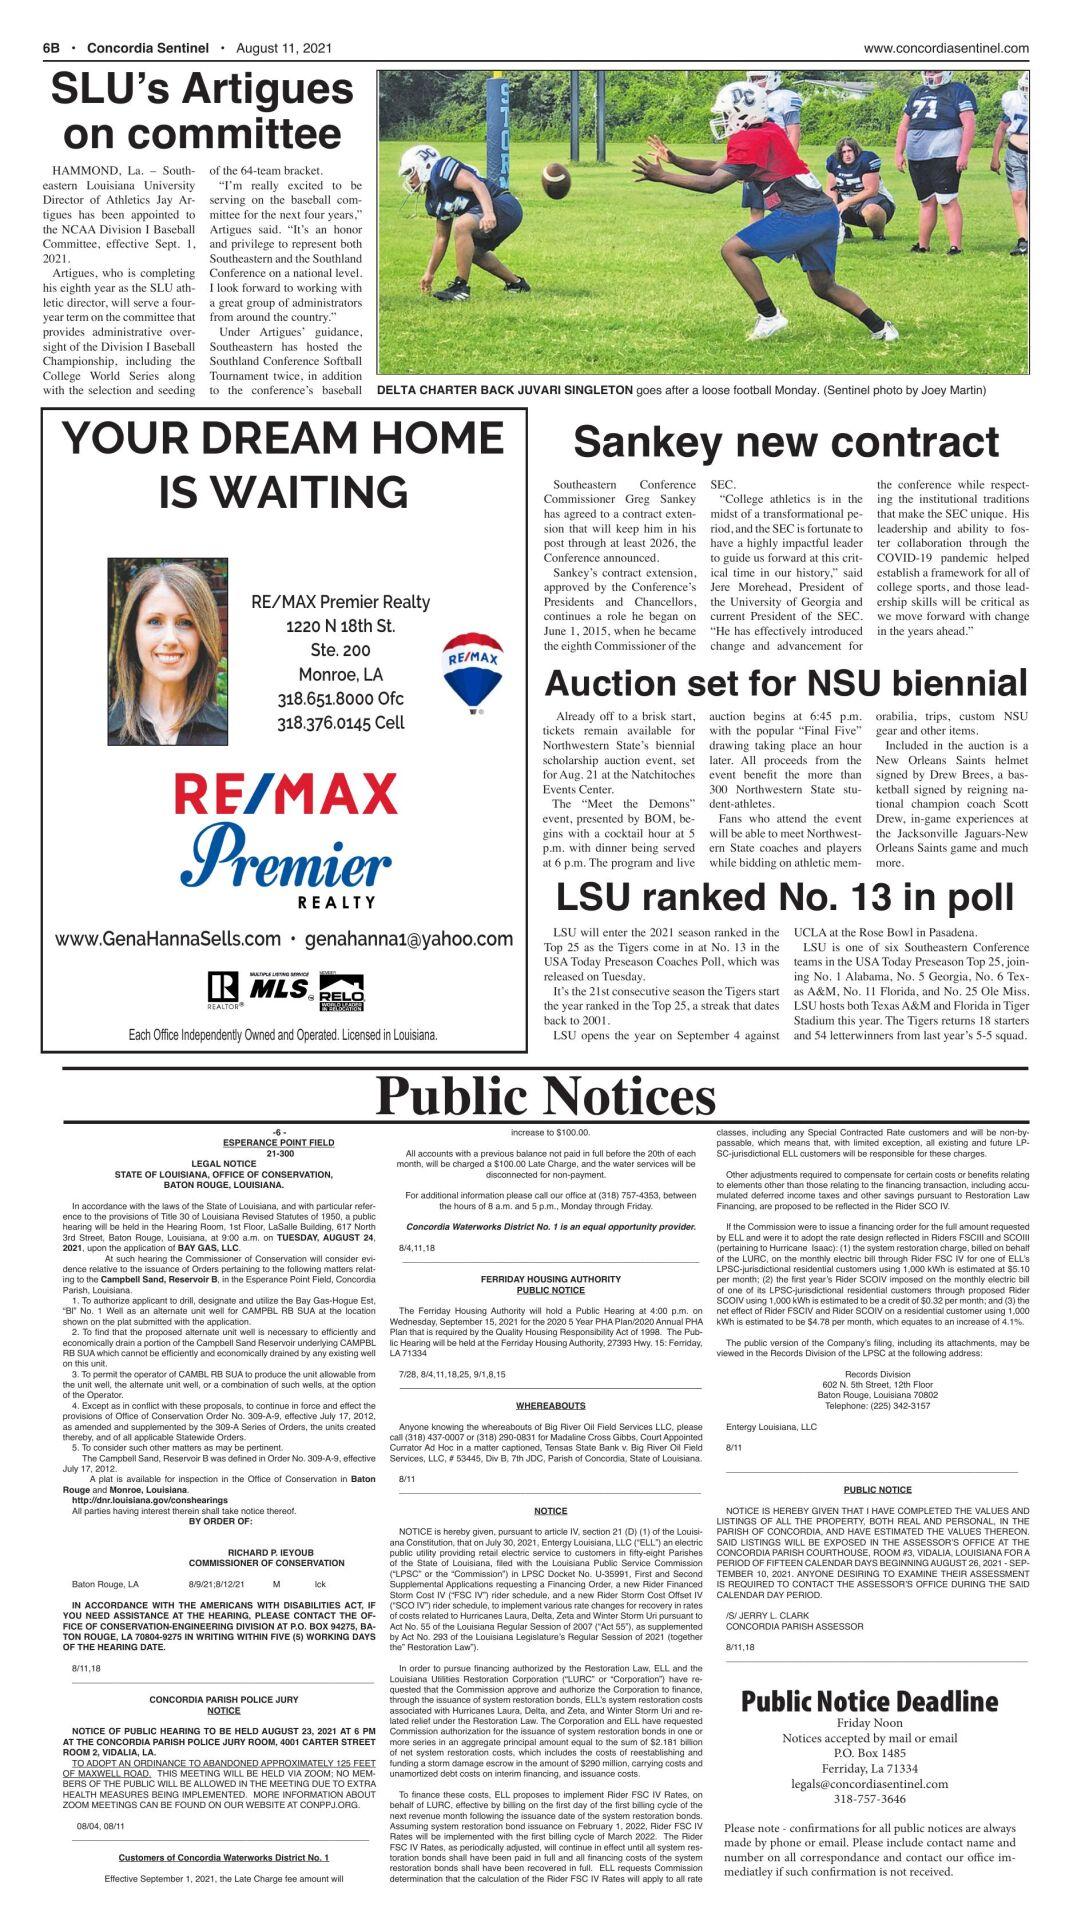 Public Notices - August 11, 2021